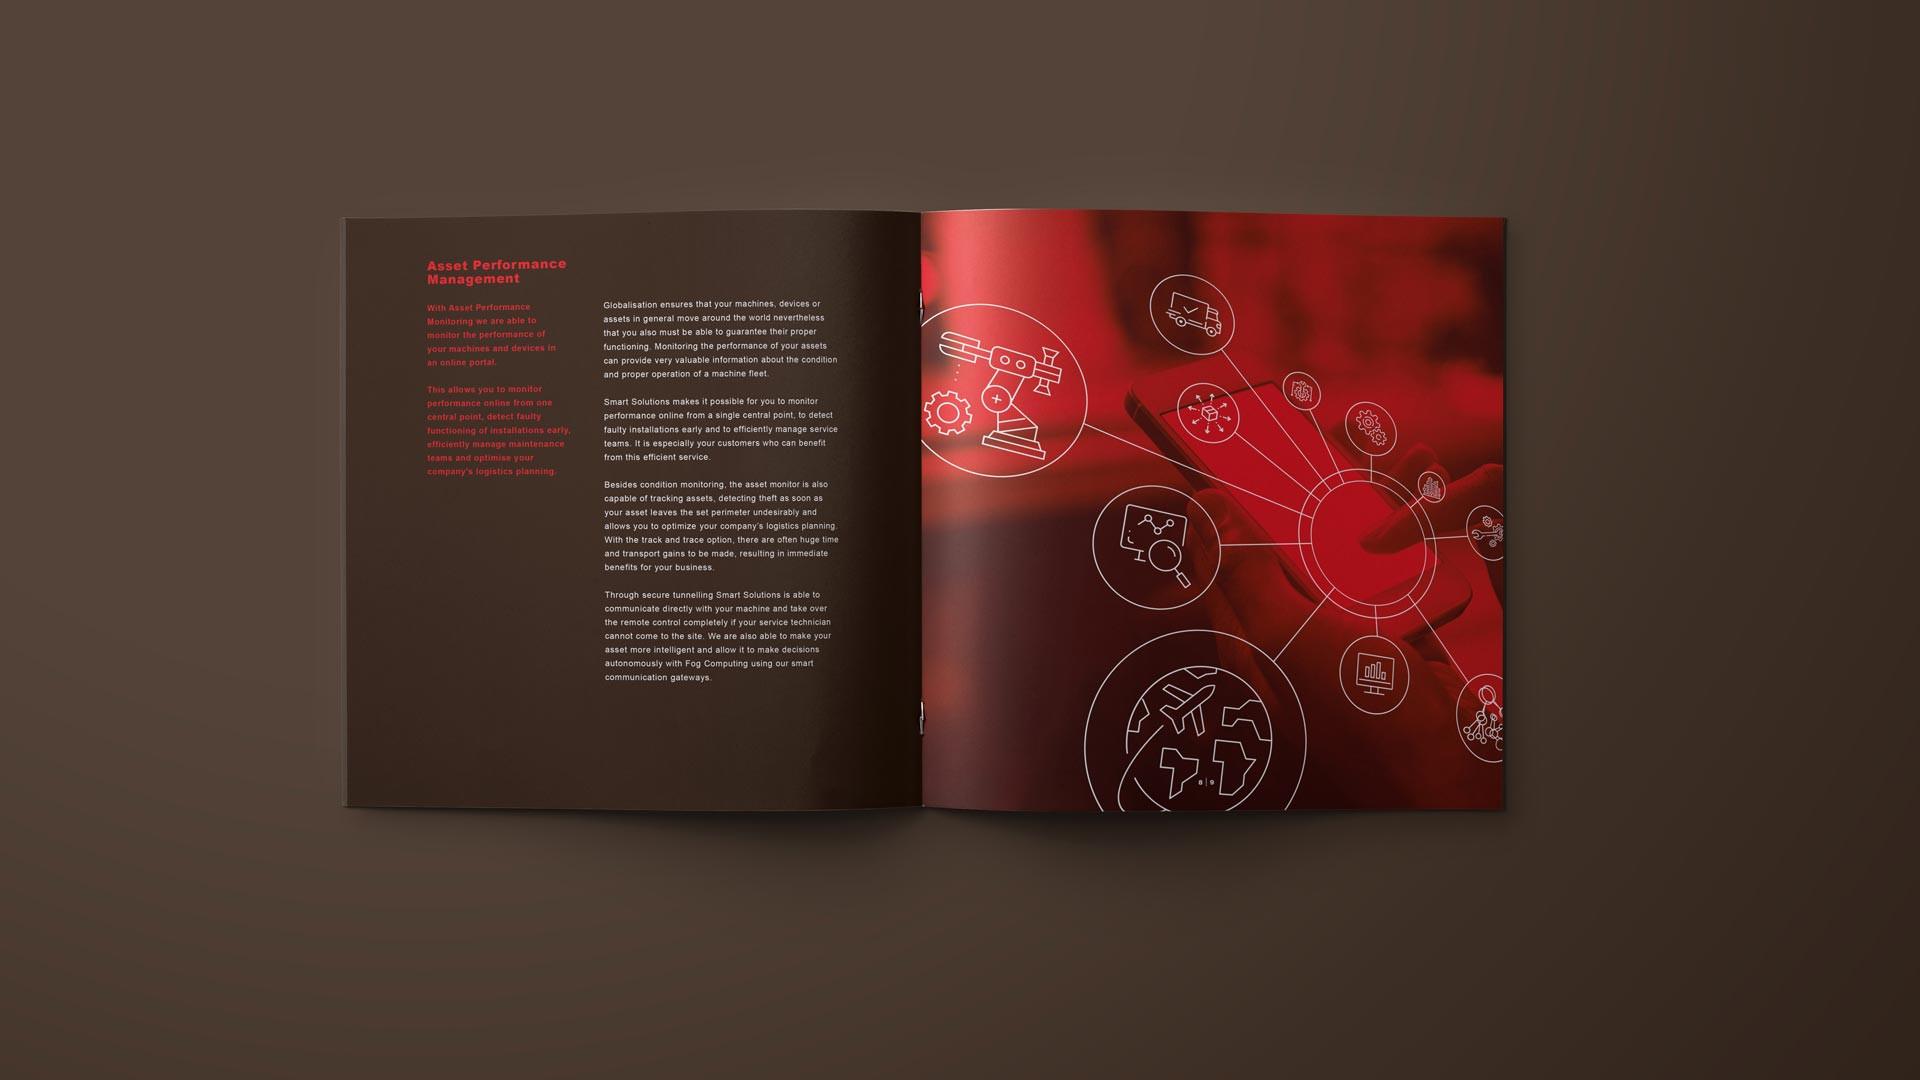 APK-Smart-Solutions-04.jpg